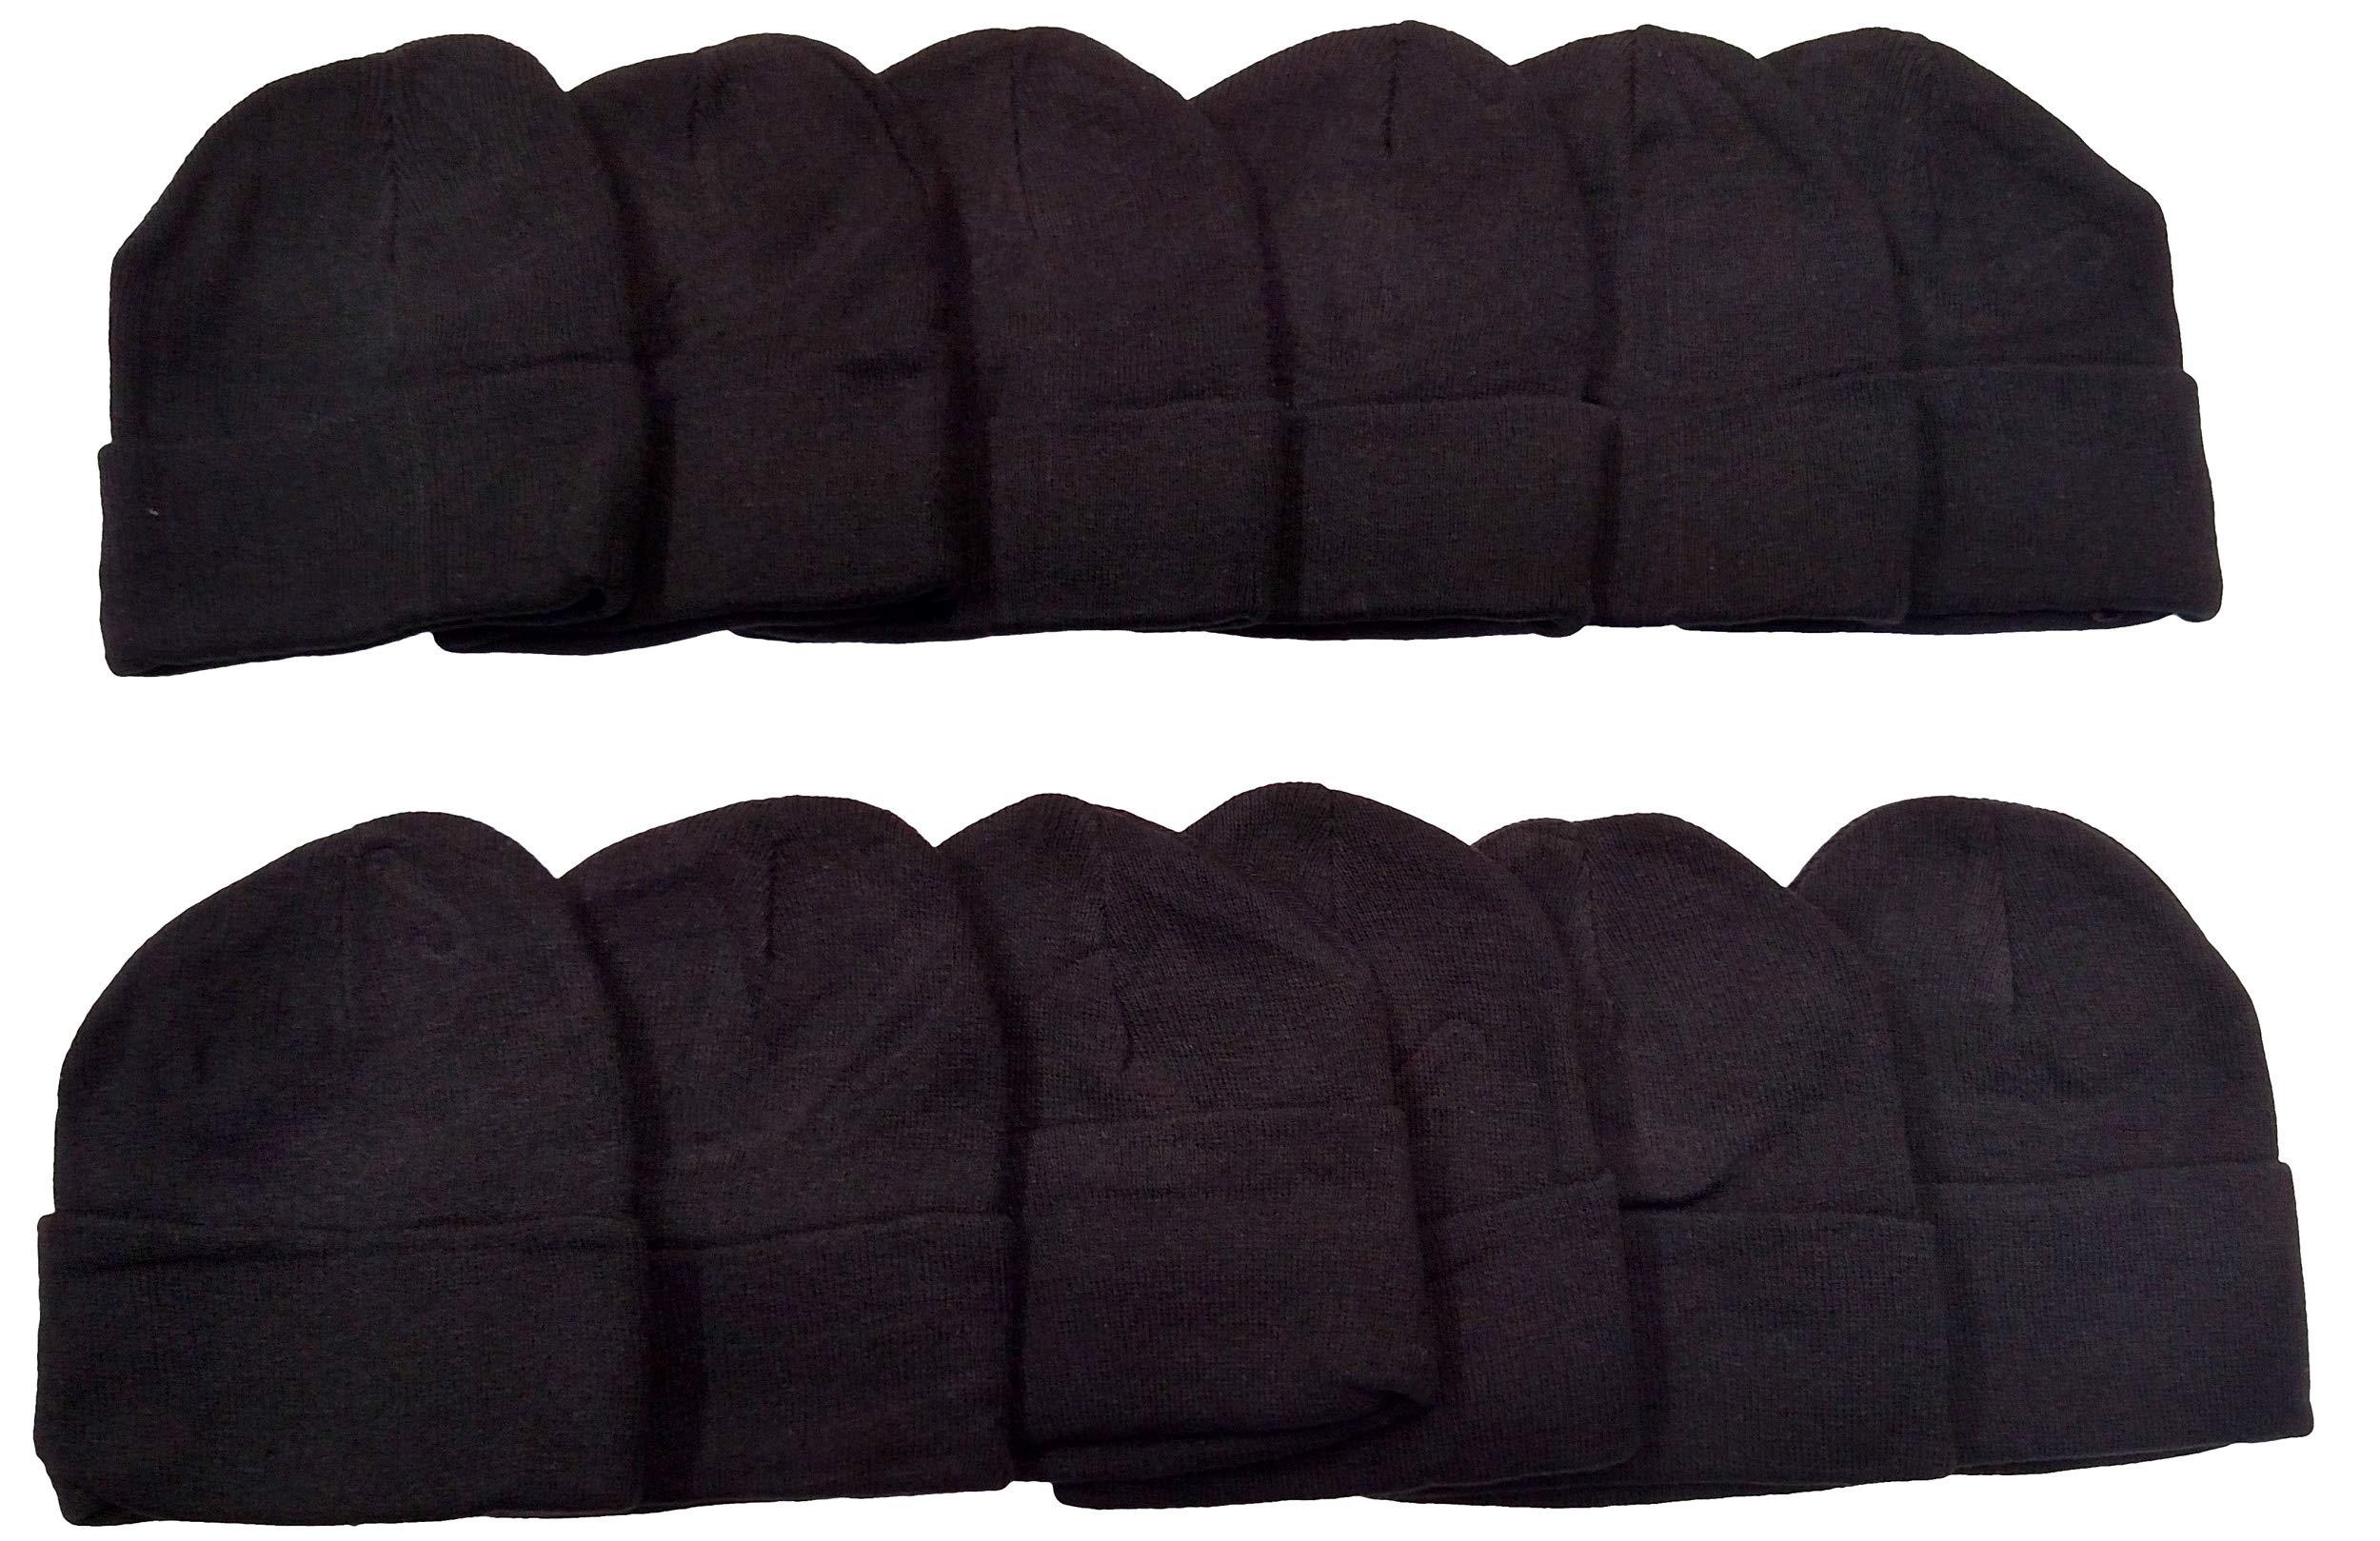 12 Pack Beanie Winter Hats Men Women, Ribbed, Cuff Skullcap Warm Thermal Hat (12 Pack Black)